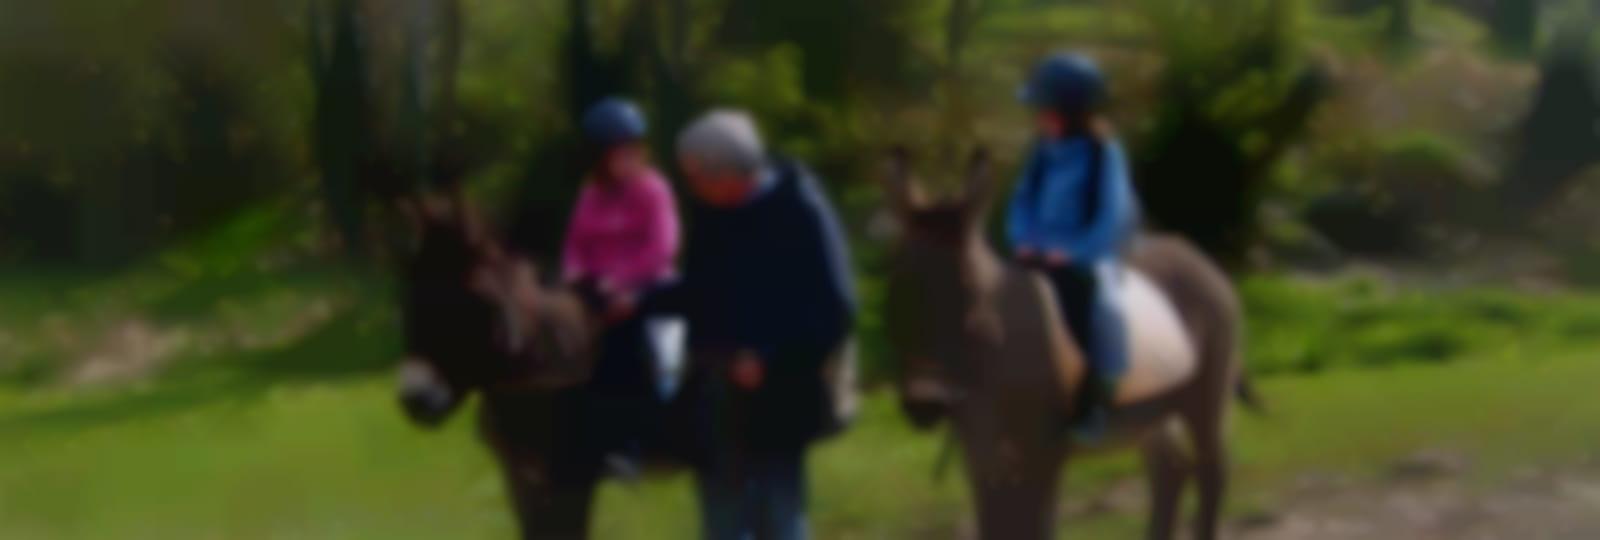 Les ânes de Malengen